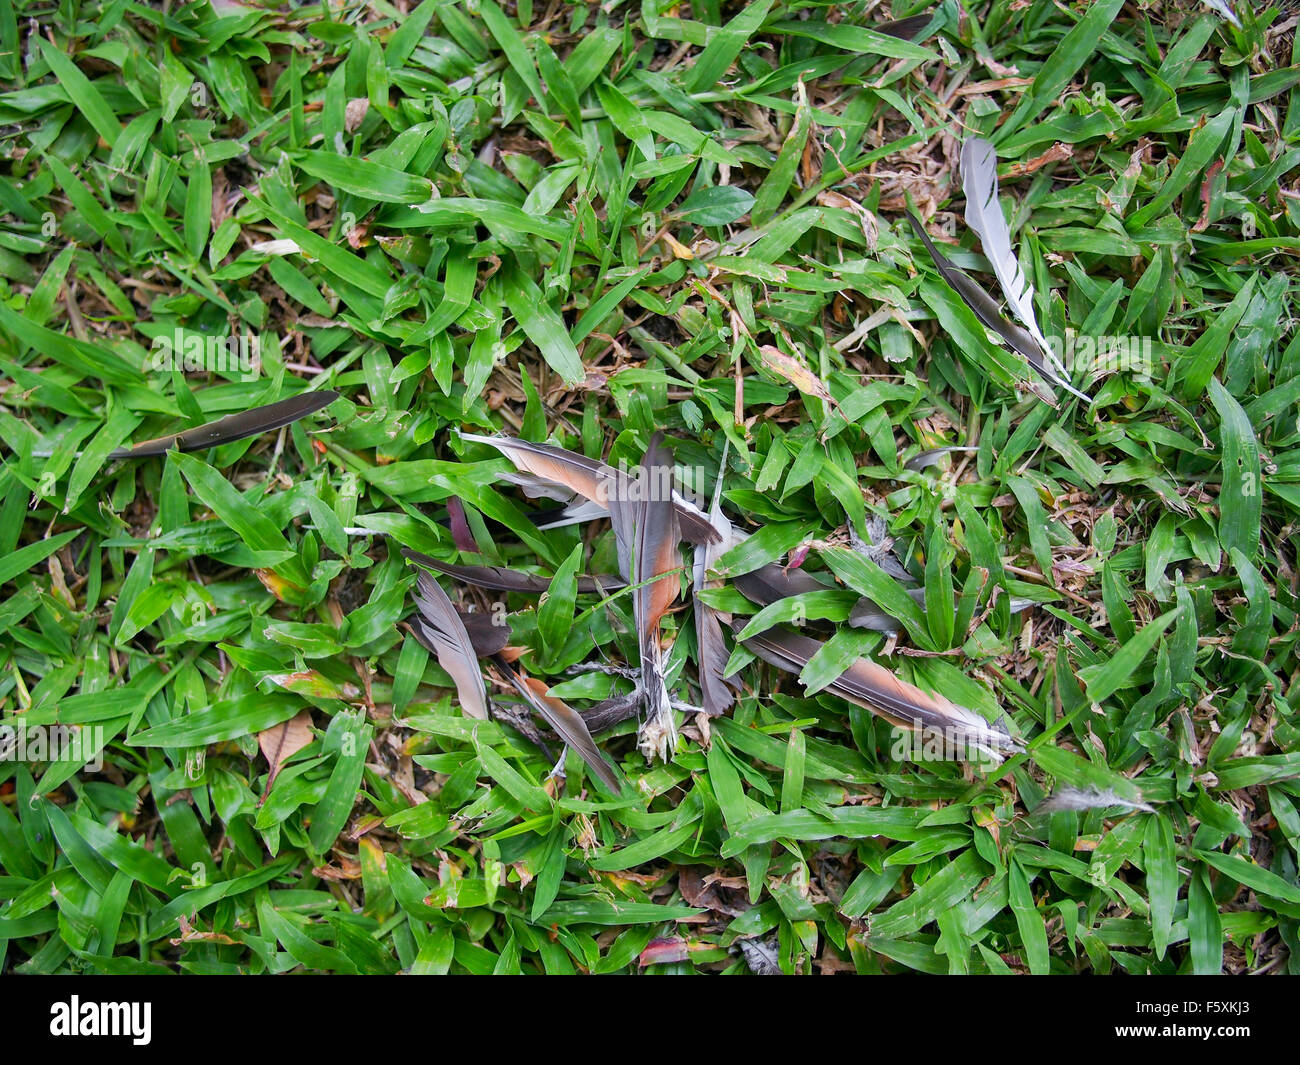 Feather Of Dead Bird On Grass Field